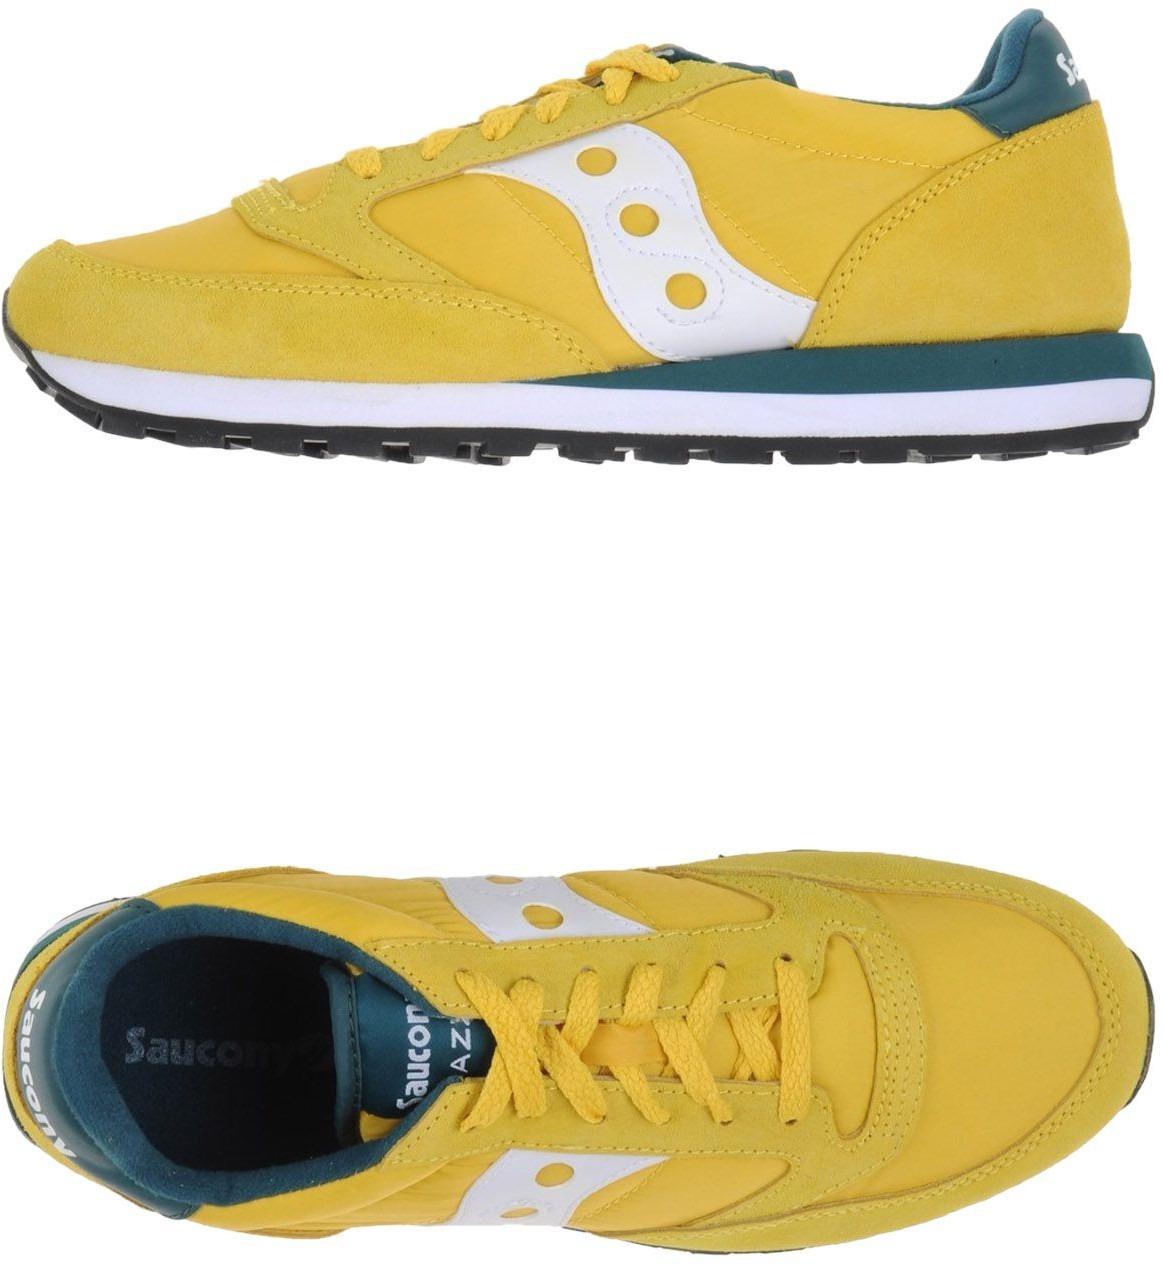 Tennis Saucony Basse Shoes Bantoa Calzature amp; Sneakers 77O6xgn